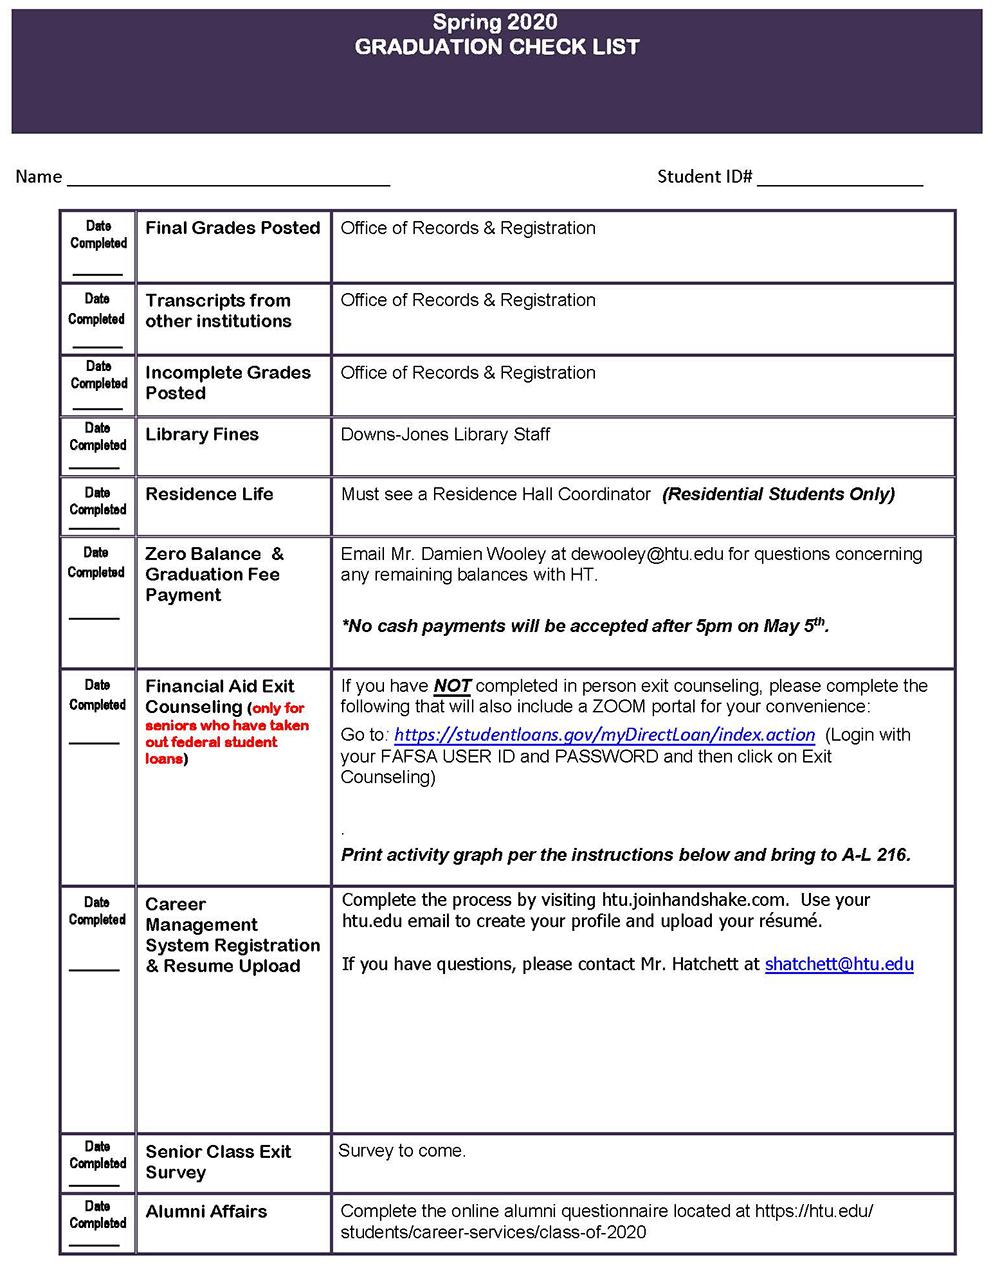 Class of 2020 Checklist